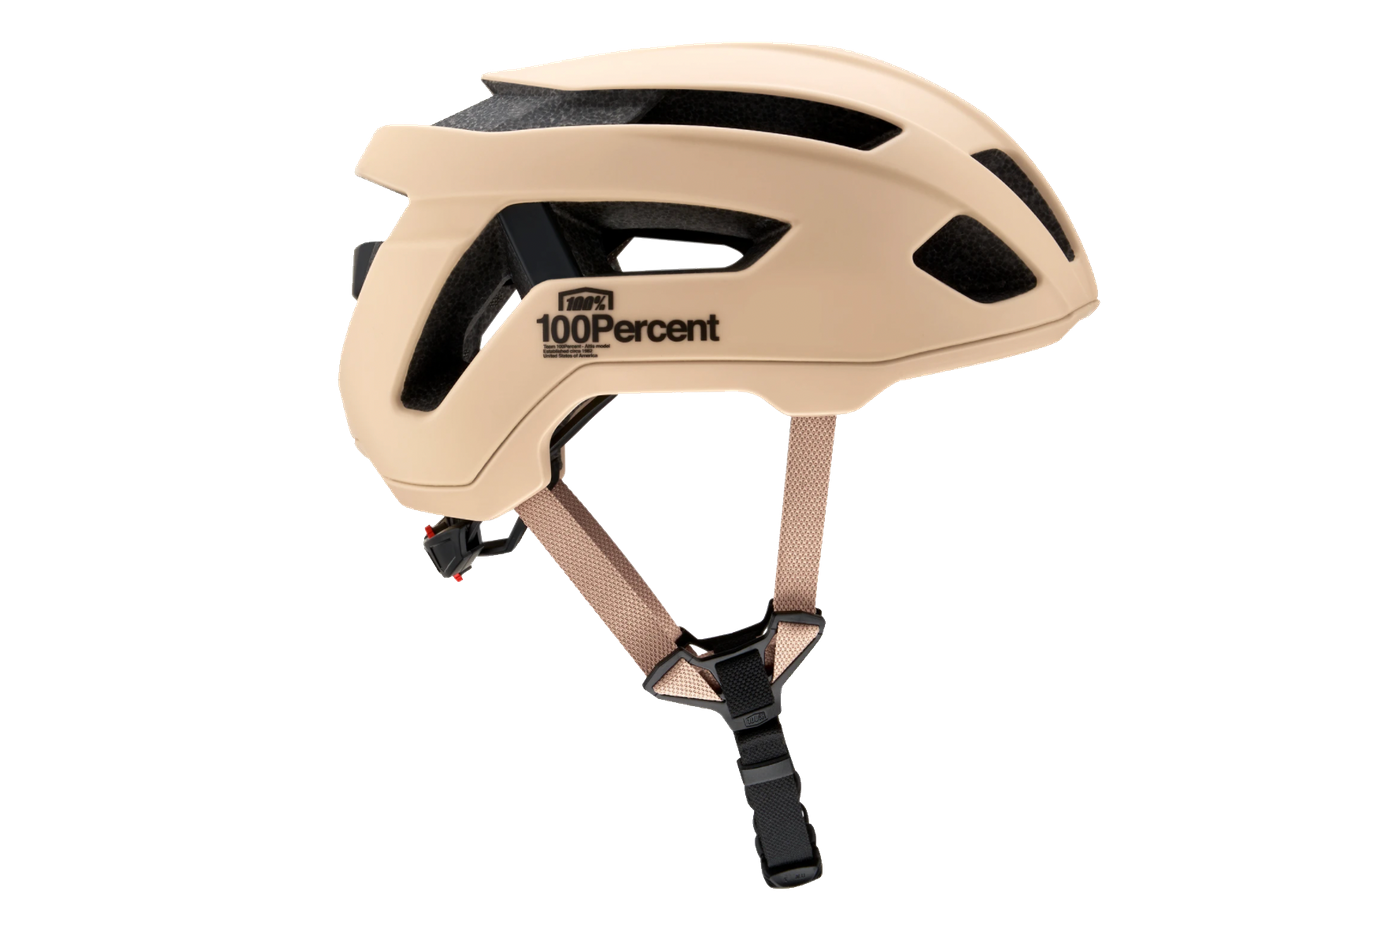 100 Percent New Altis Gravel Helmet